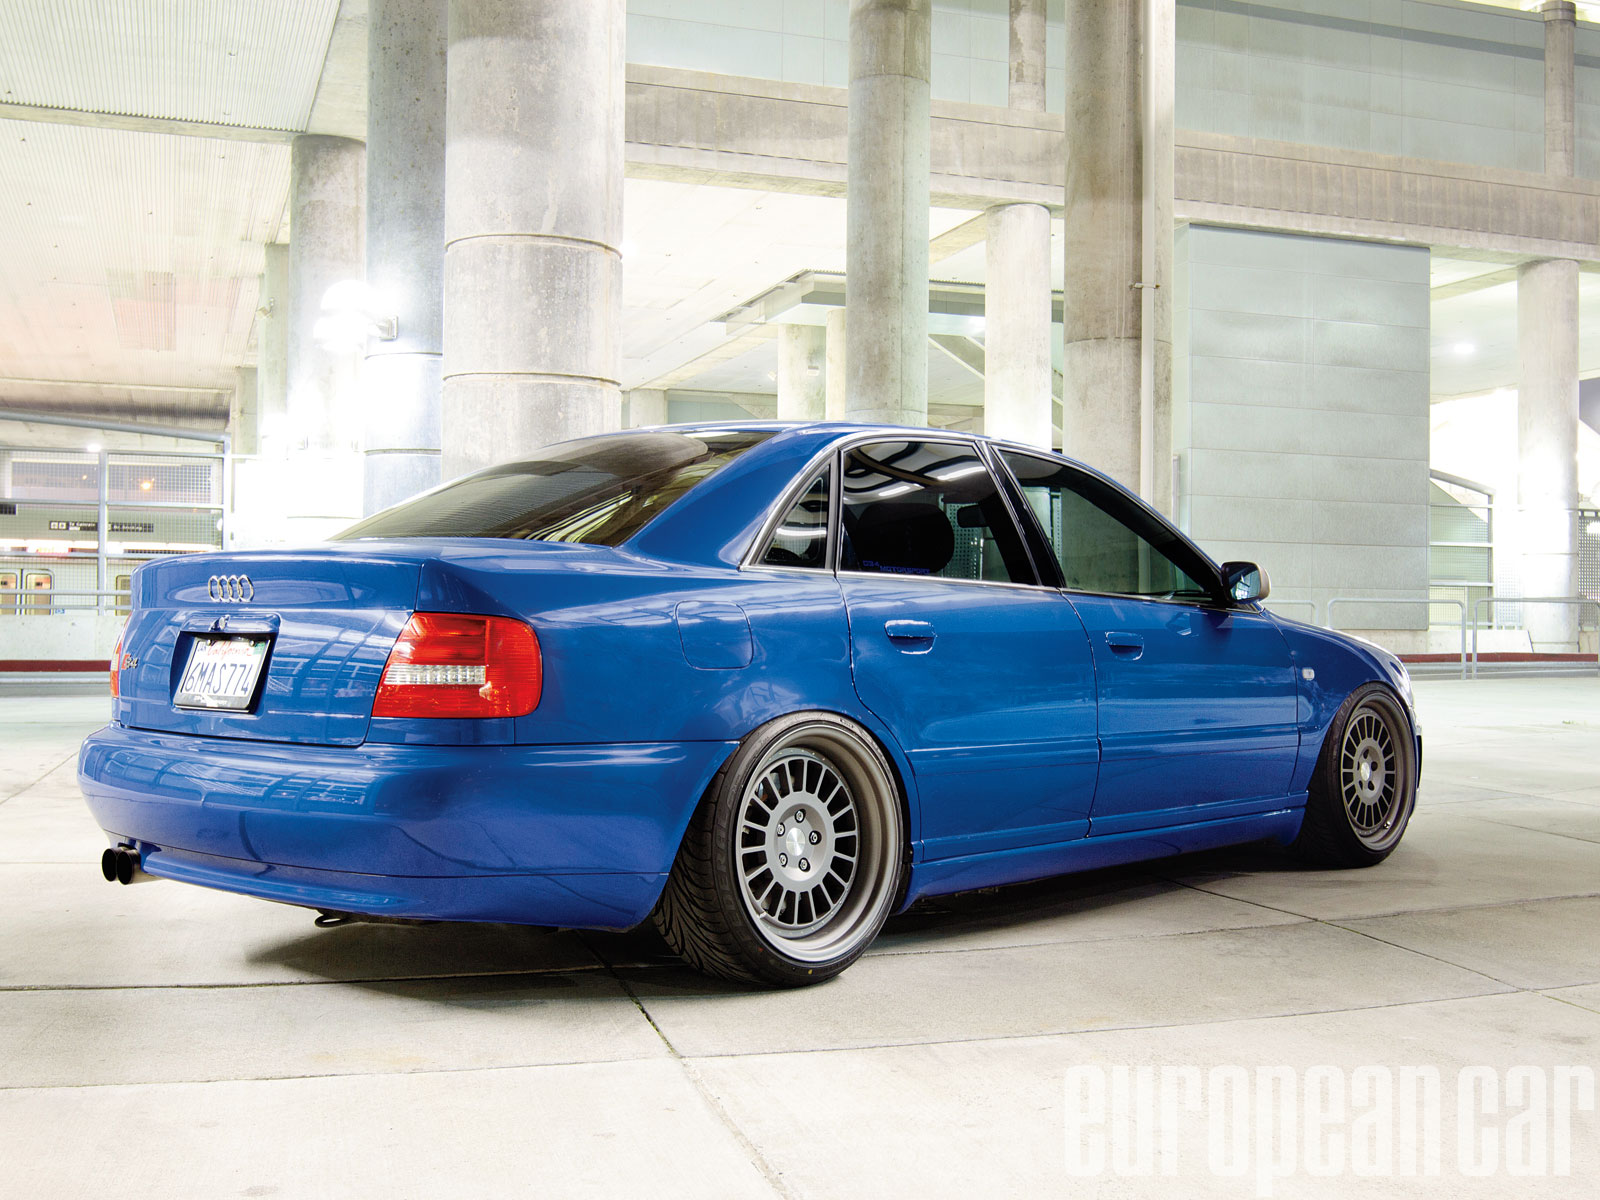 2001 Audi S4 Image 13